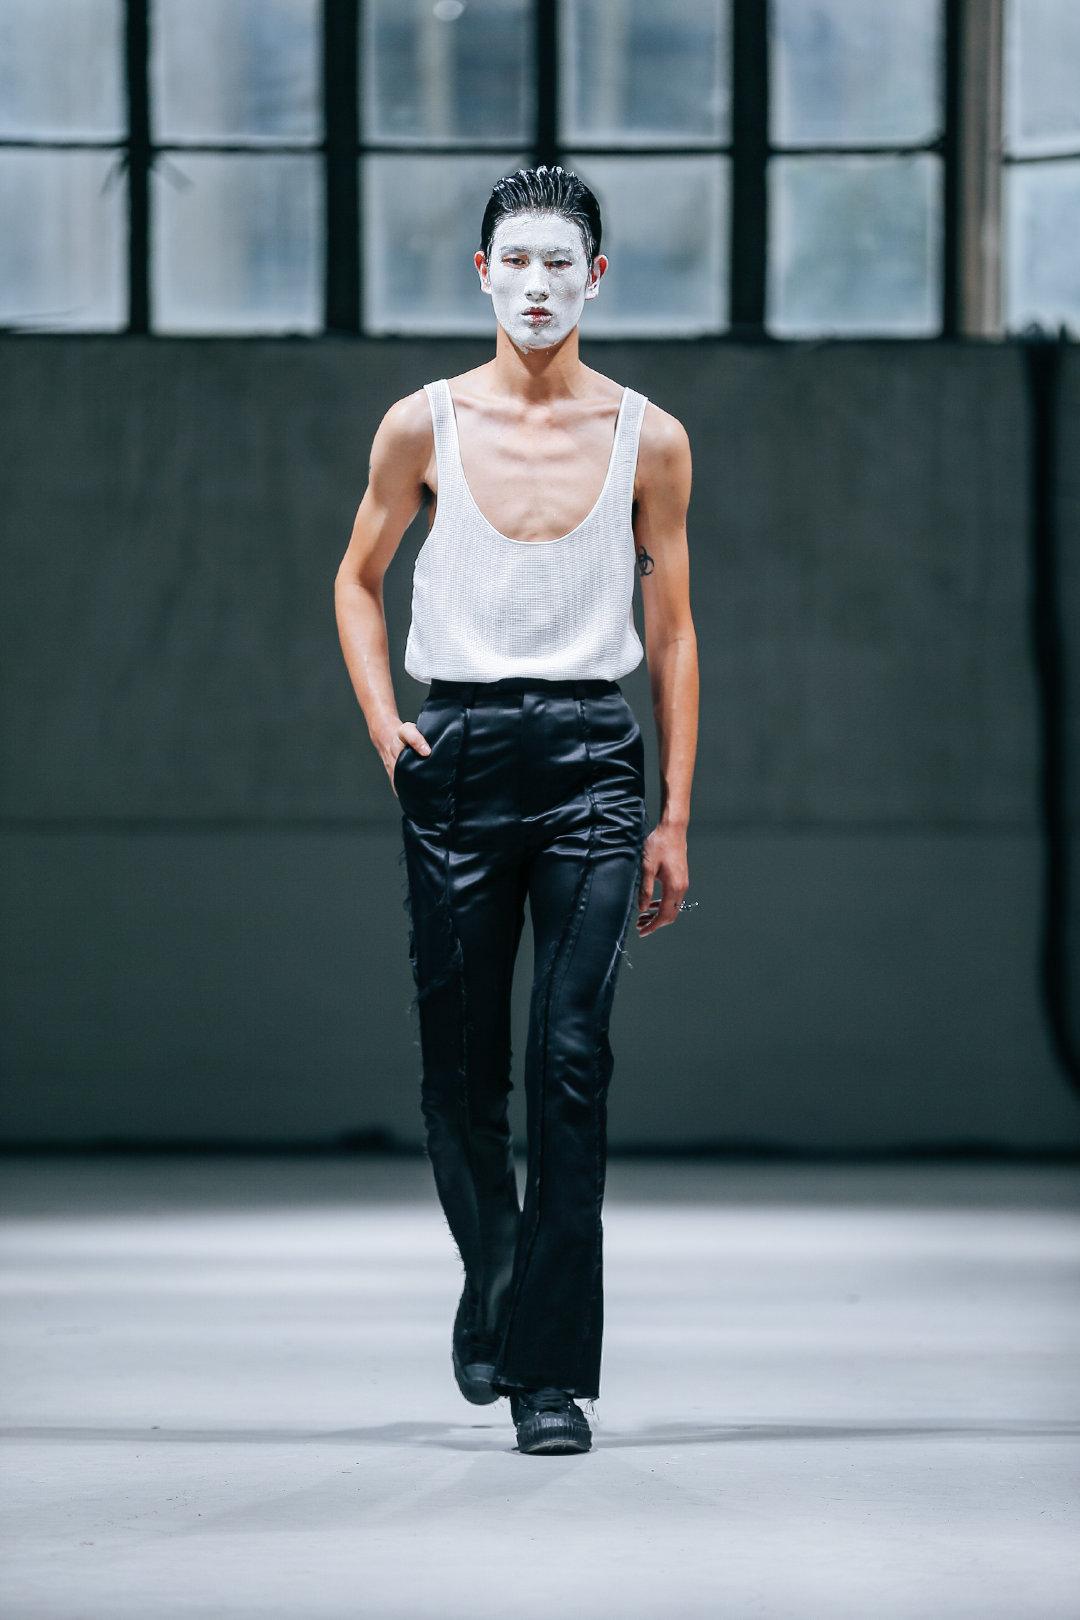 男装品牌DANSHAN于上海时装周为LABELHOOD 2020春夏揭开序幕